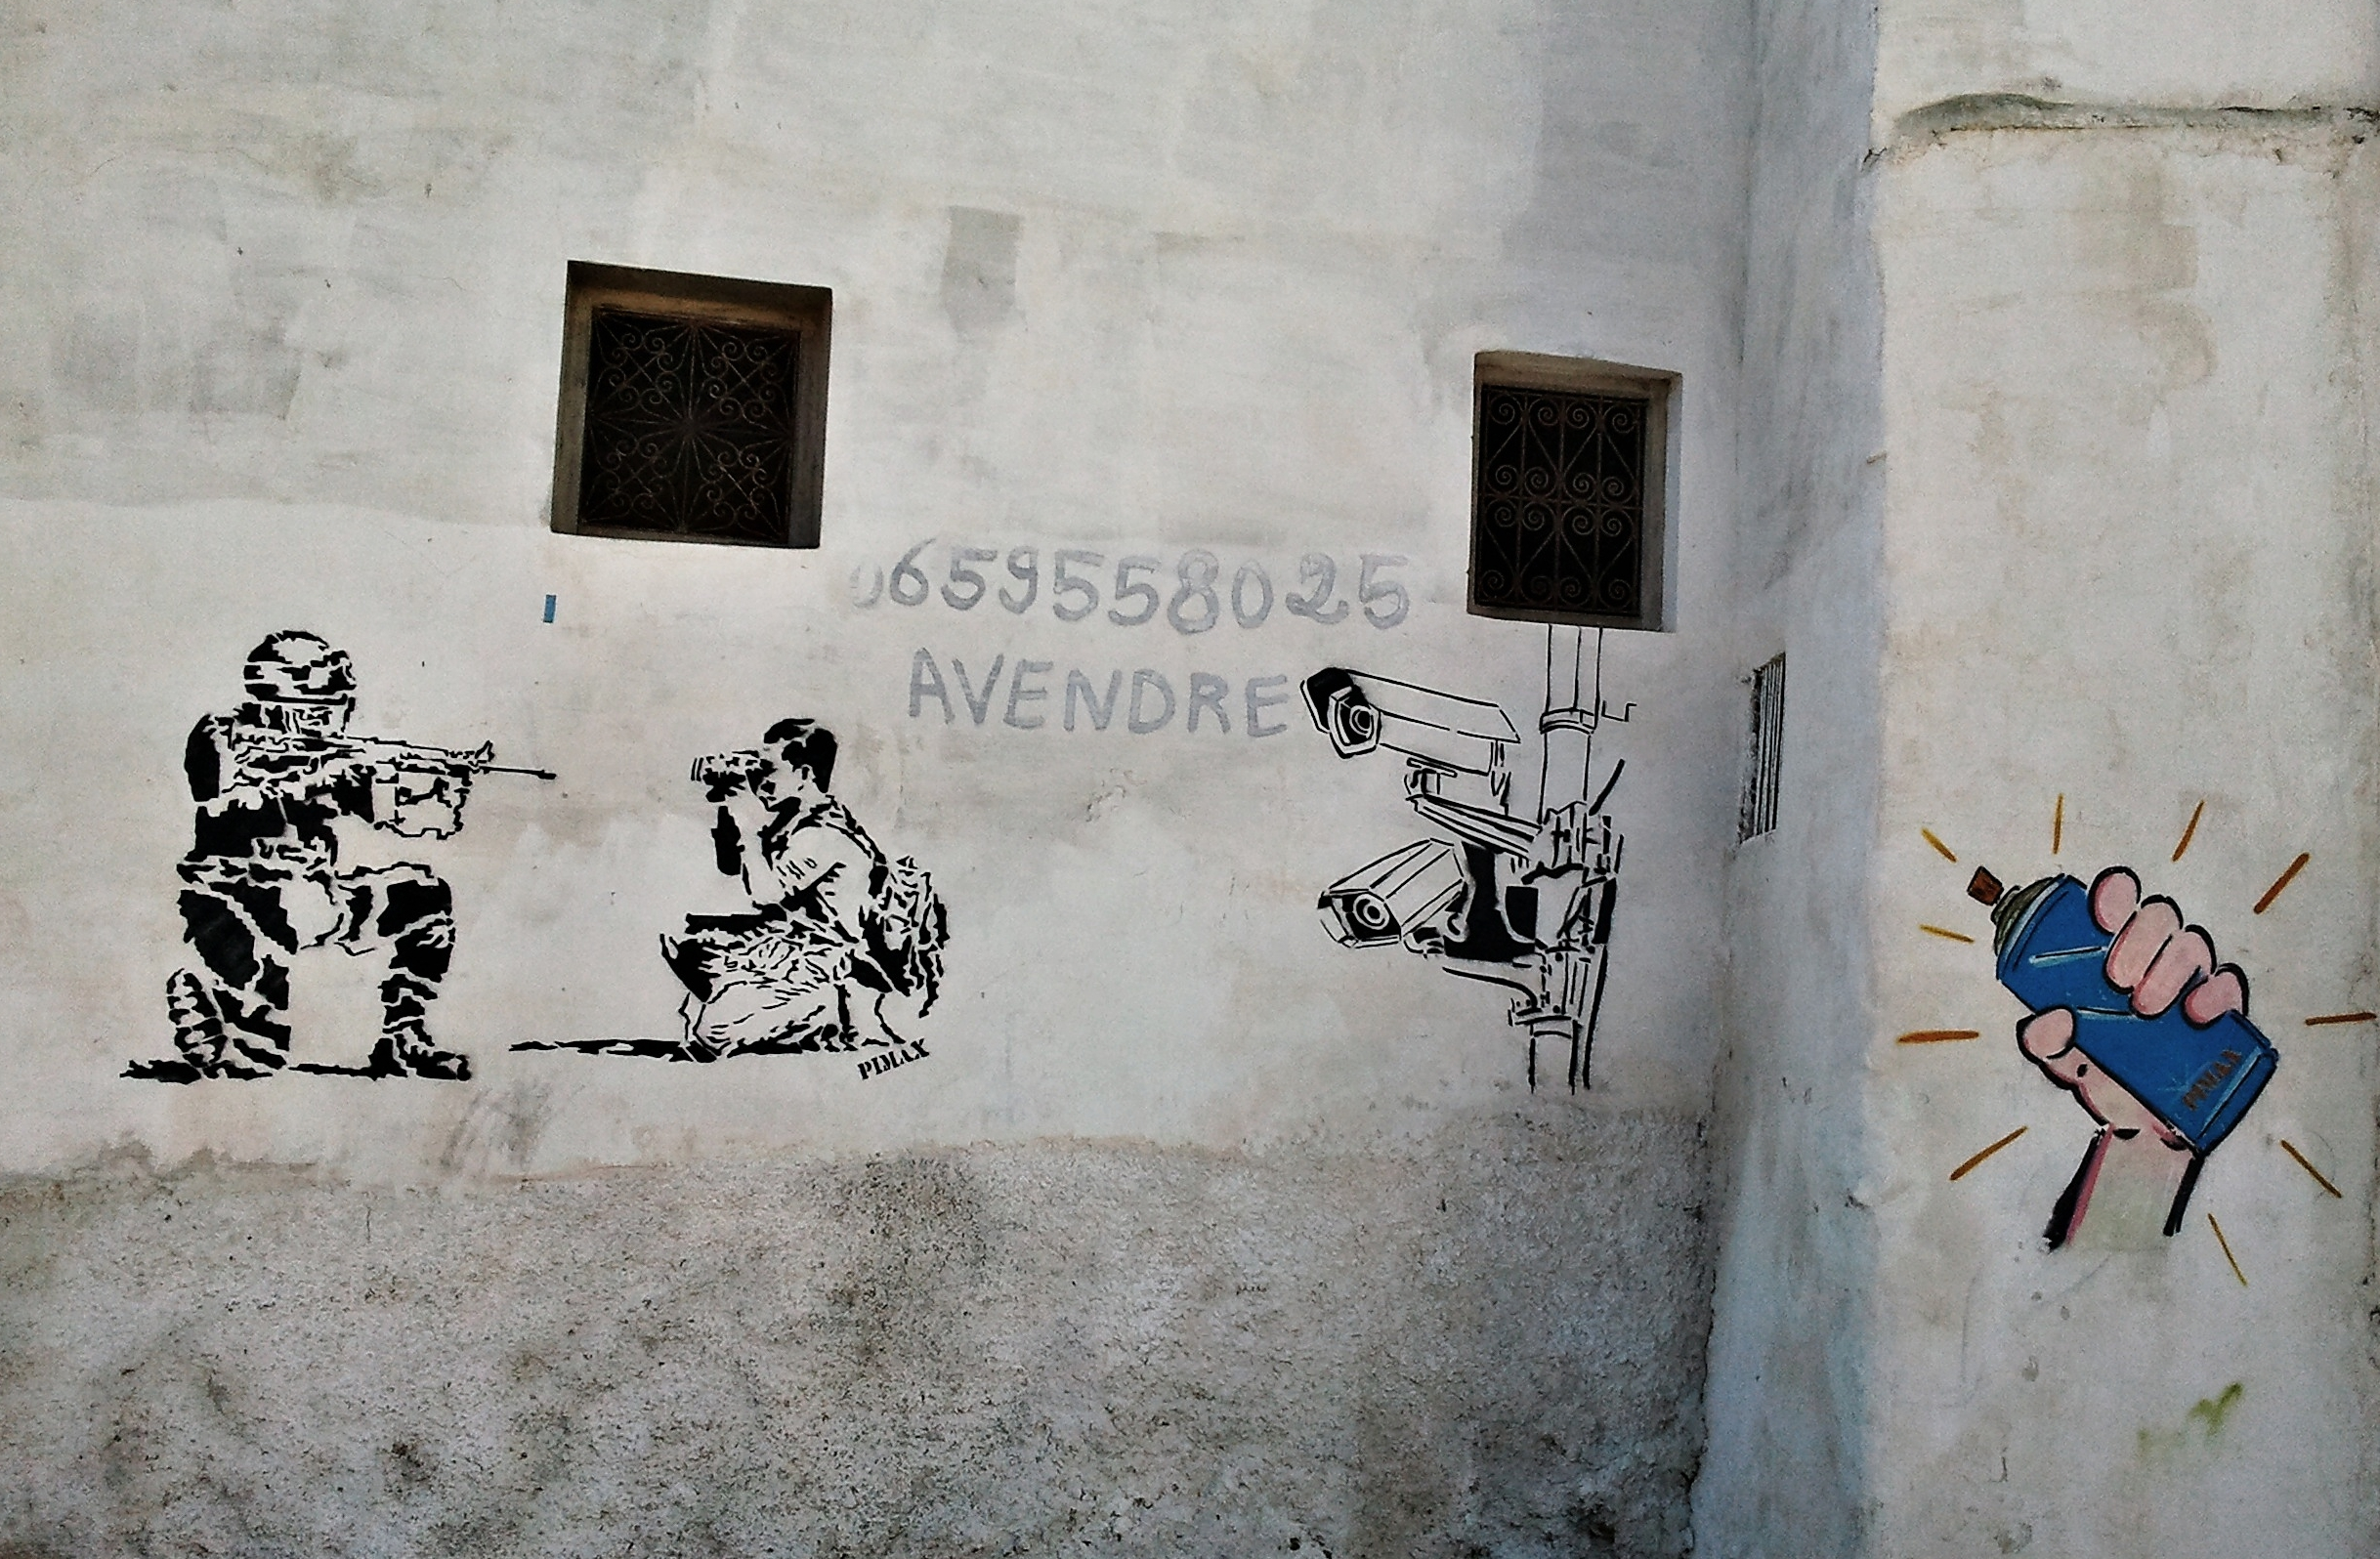 Zuidland – Dakar (part 1)